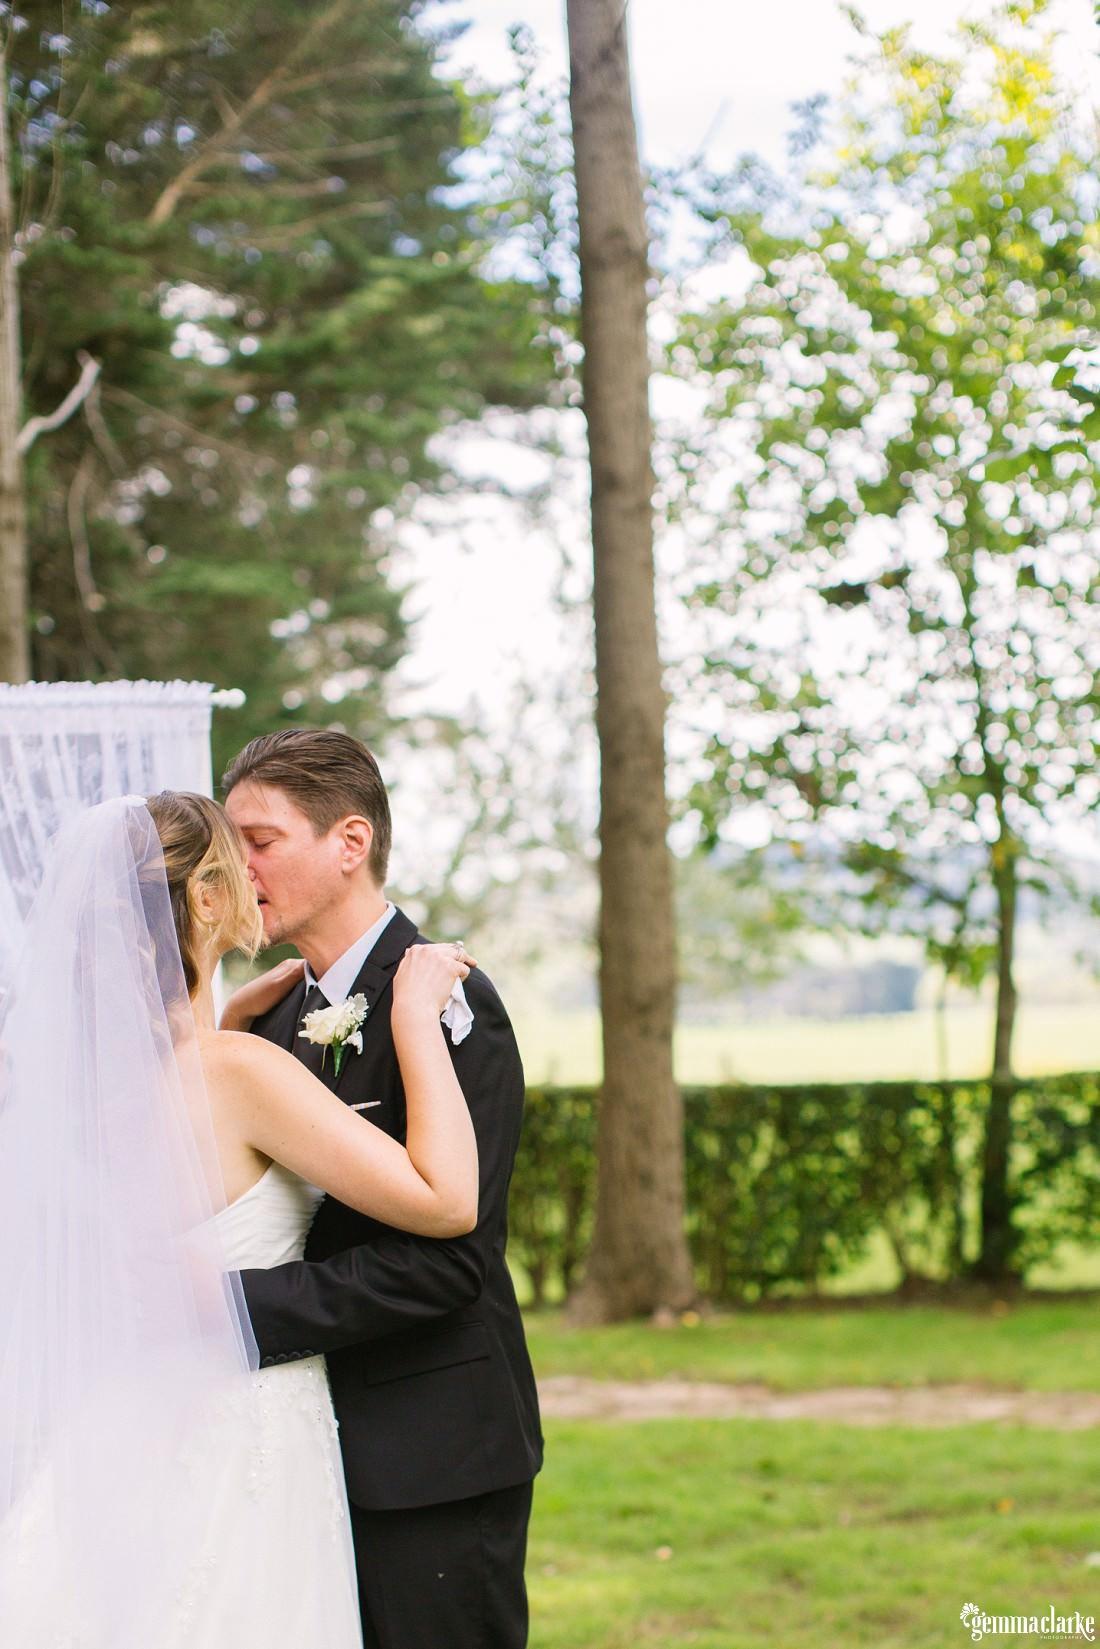 gemma-clarke-photography_summerlees-wedding_southern-highlands-wedding_erin-and-alistair_0039